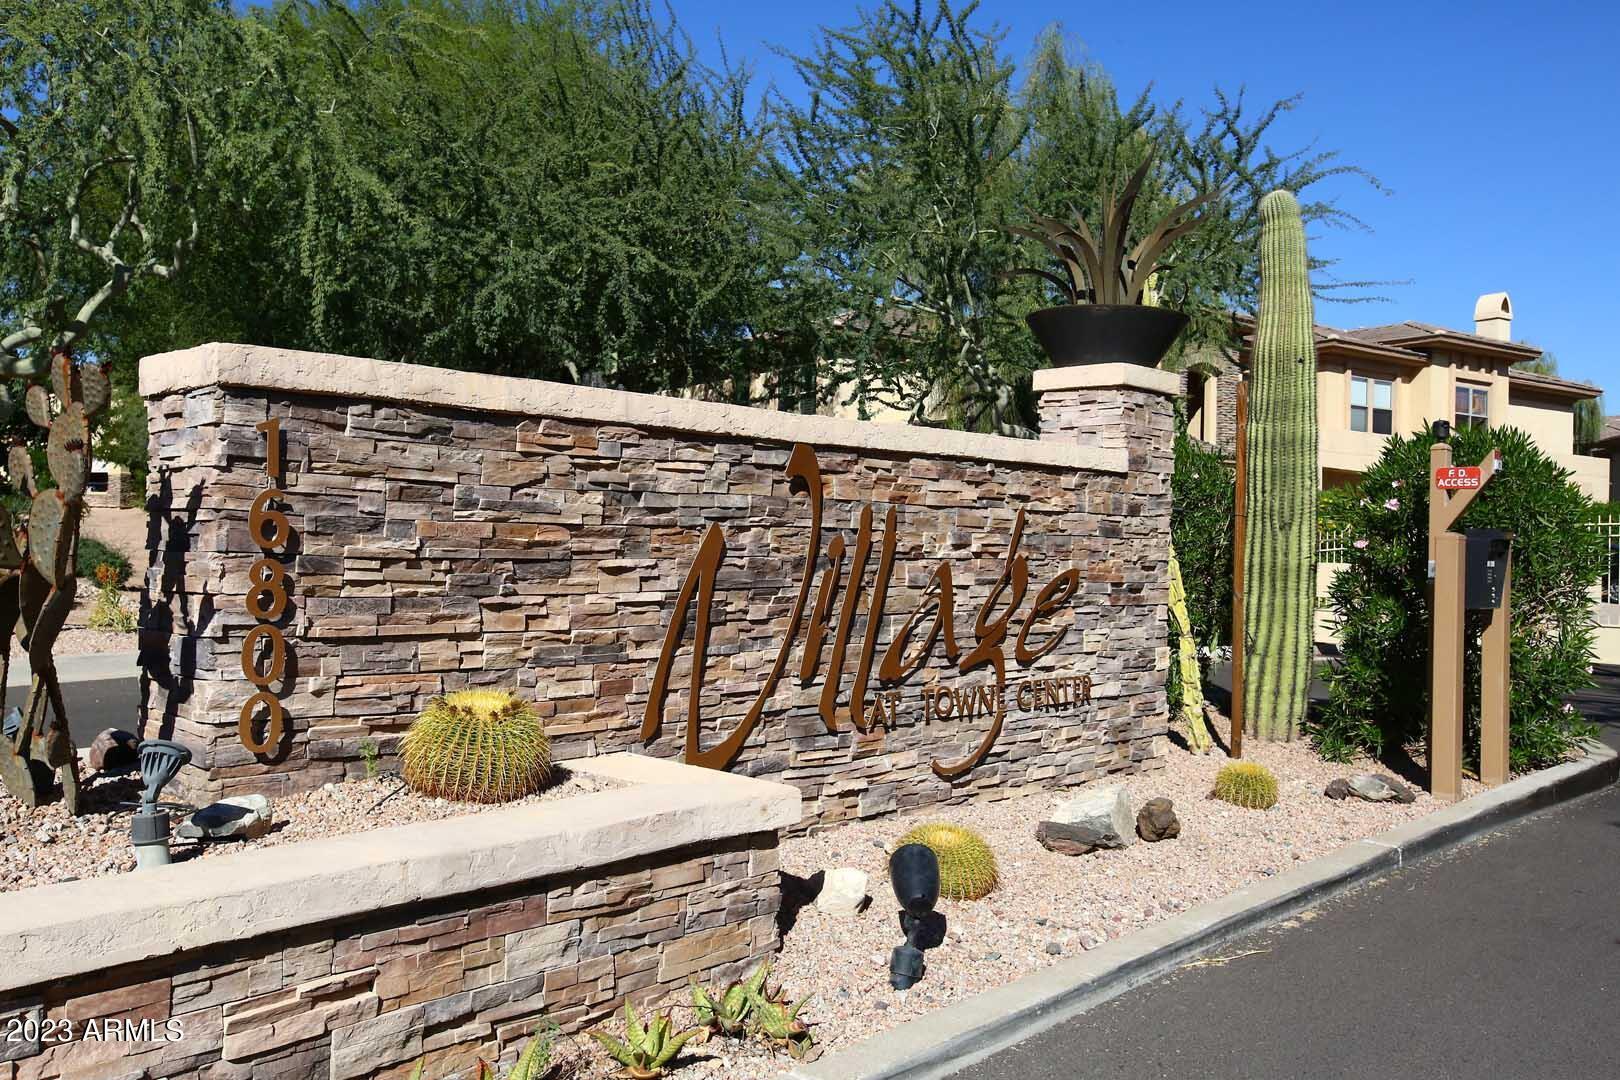 16800 E El Lago Boulevard, Unit 2064, Fountain Hills AZ 85268 - Photo 1